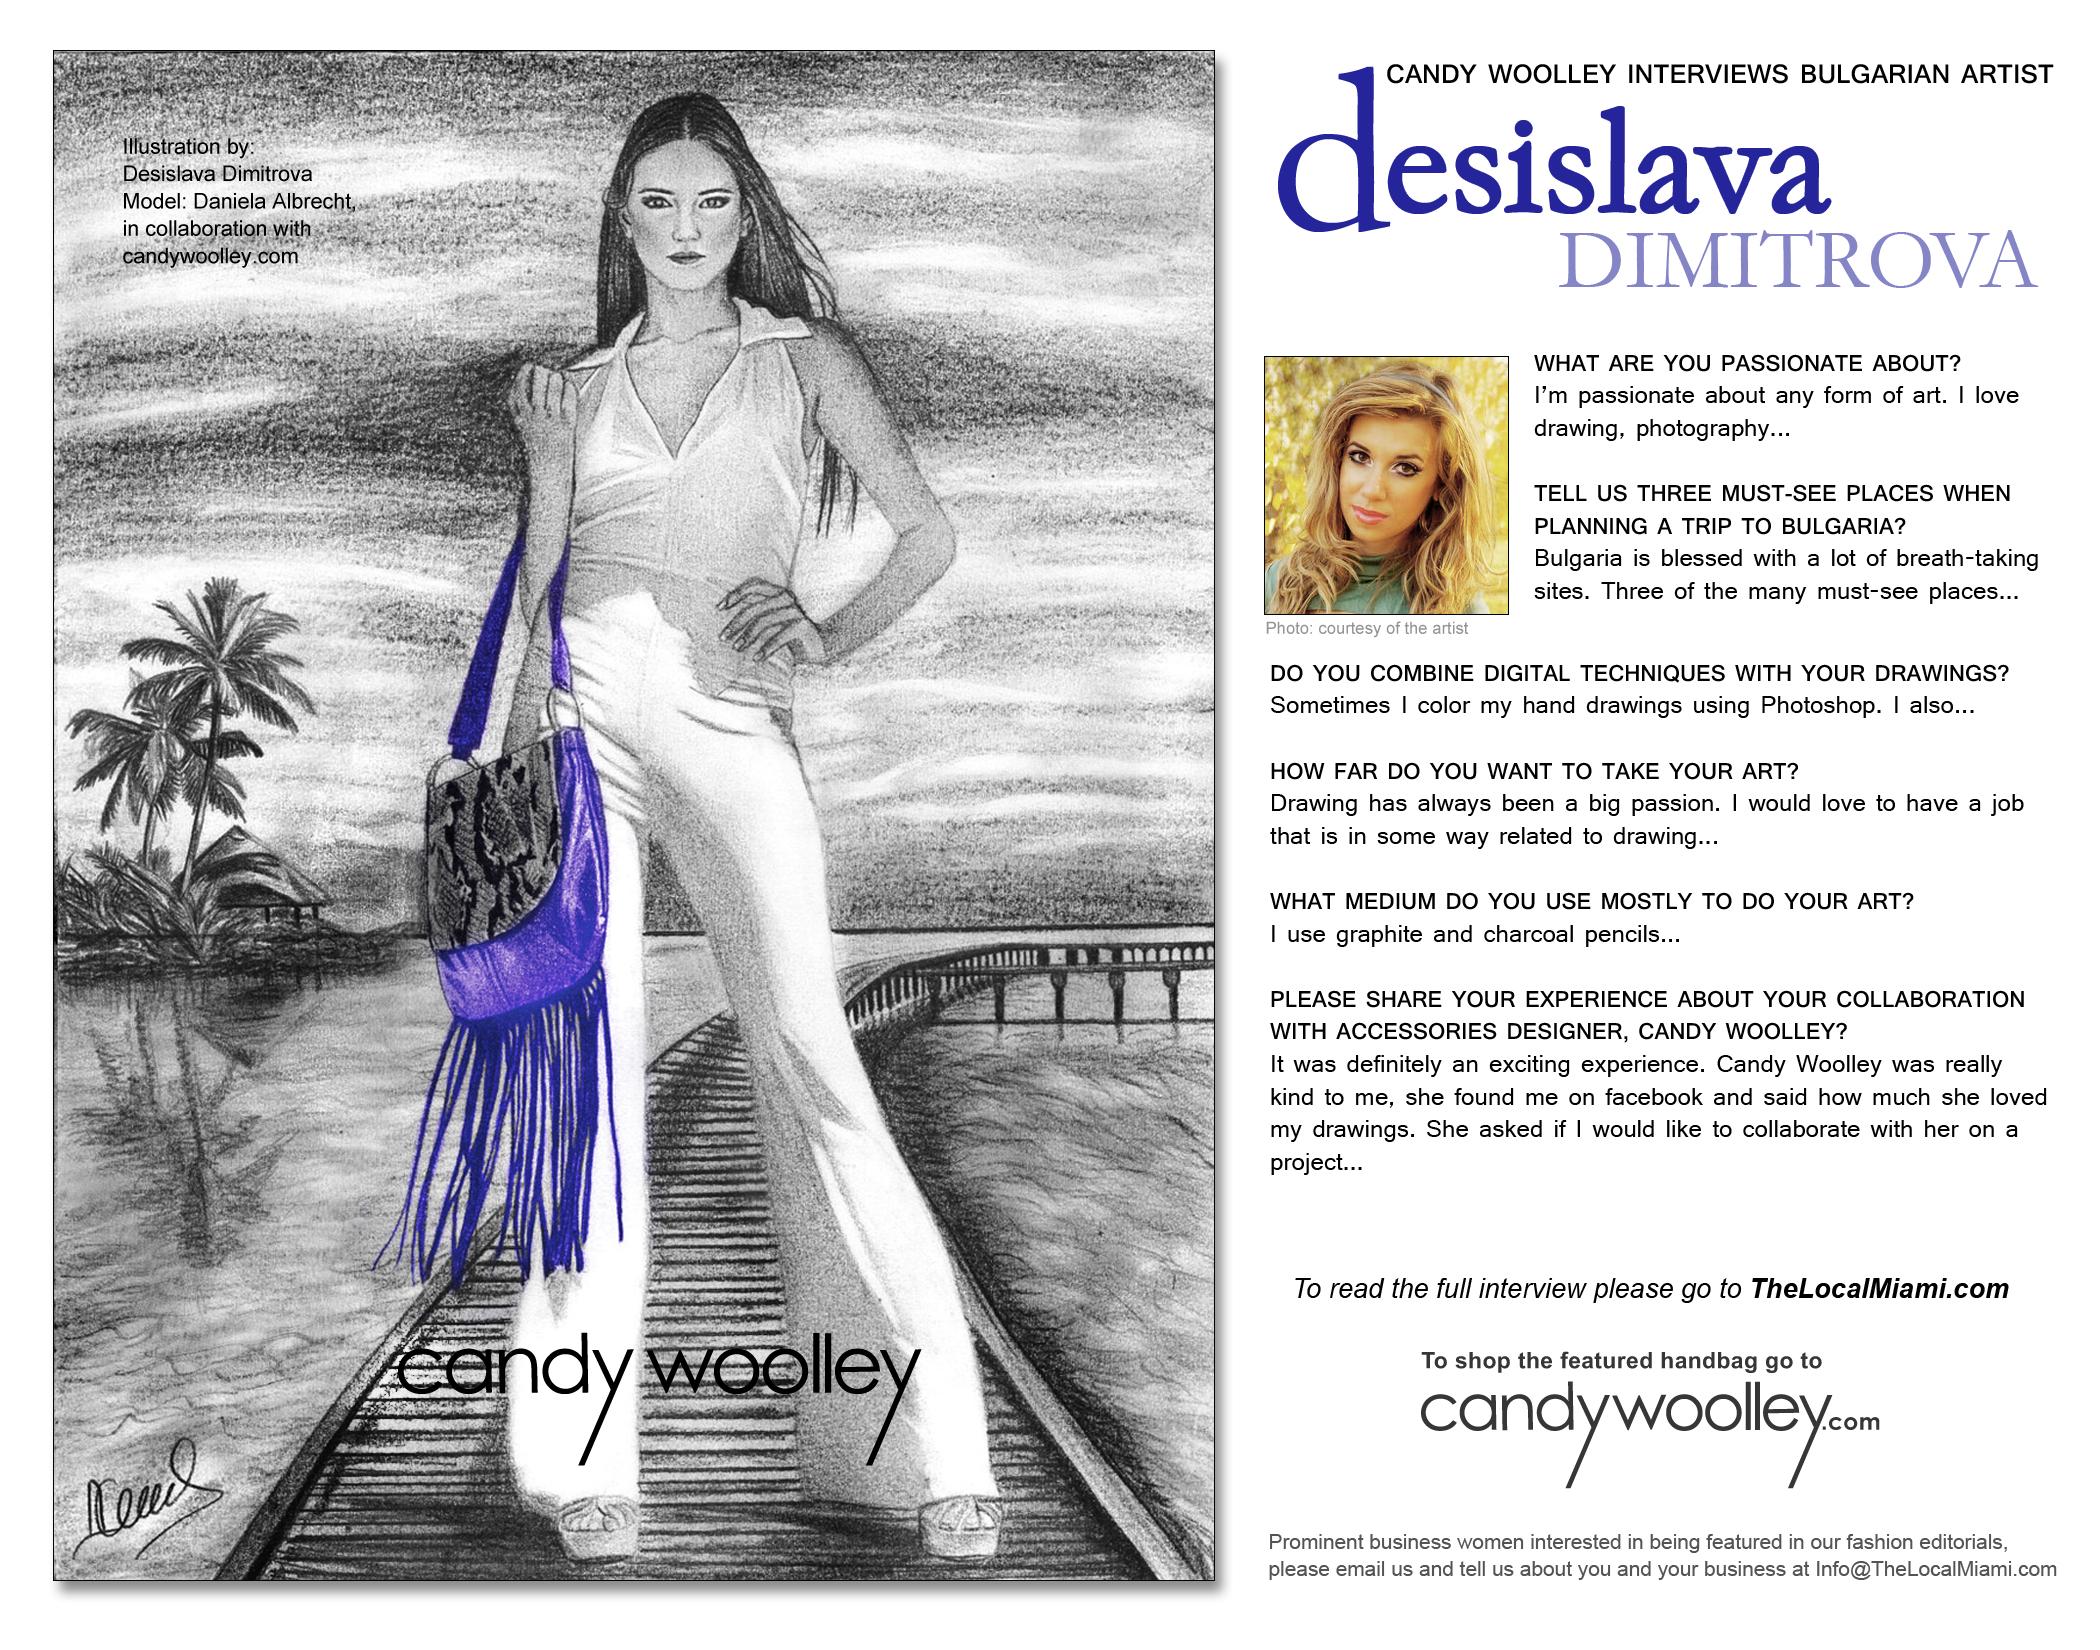 Desislava Dimitrova March 2014 Teaser